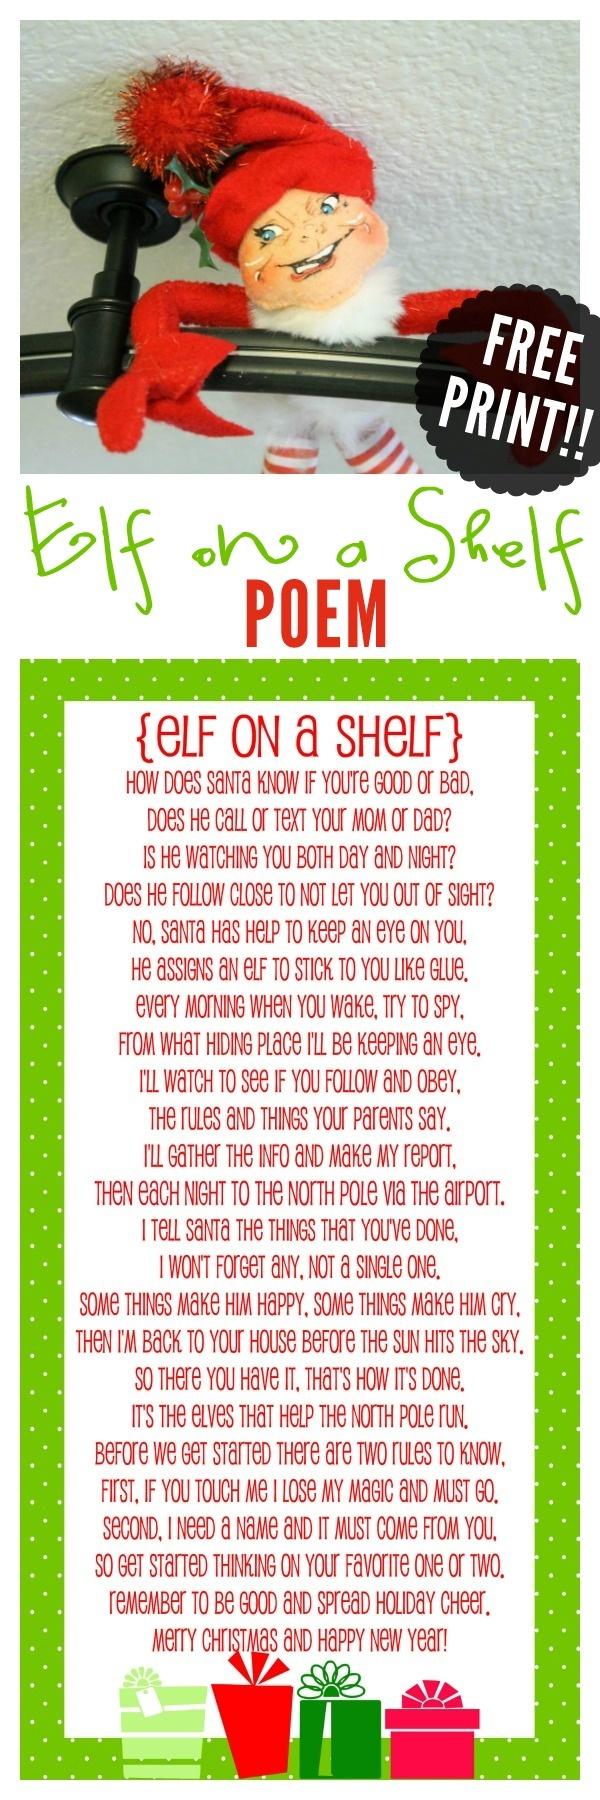 Elf On The Shelf Story - Free Printable Poem   Christmas Help   Elf - Free Printable Elf On The Shelf Story